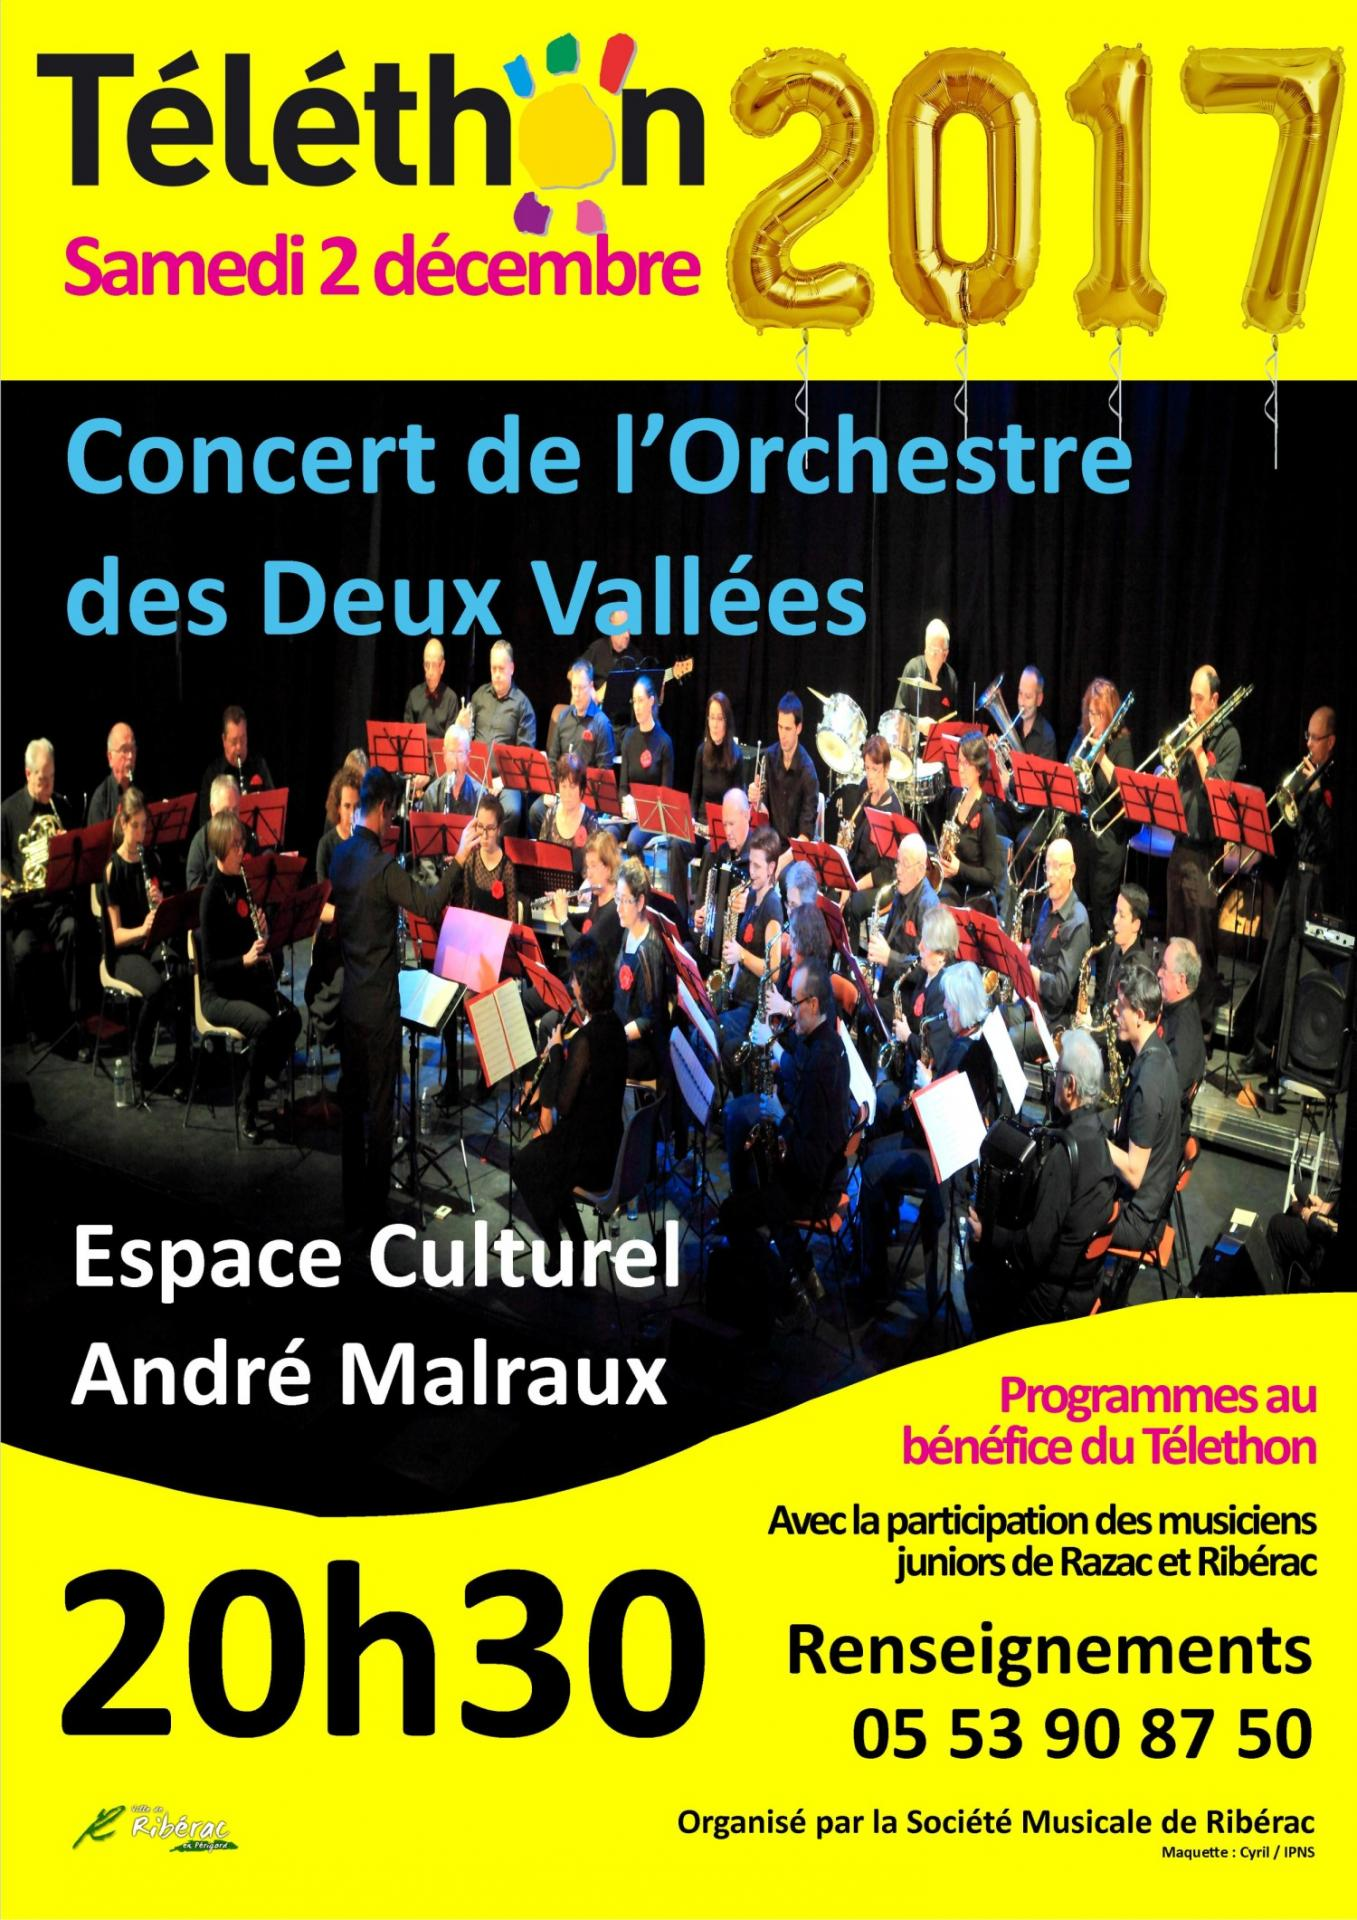 Affiche red concert telethon